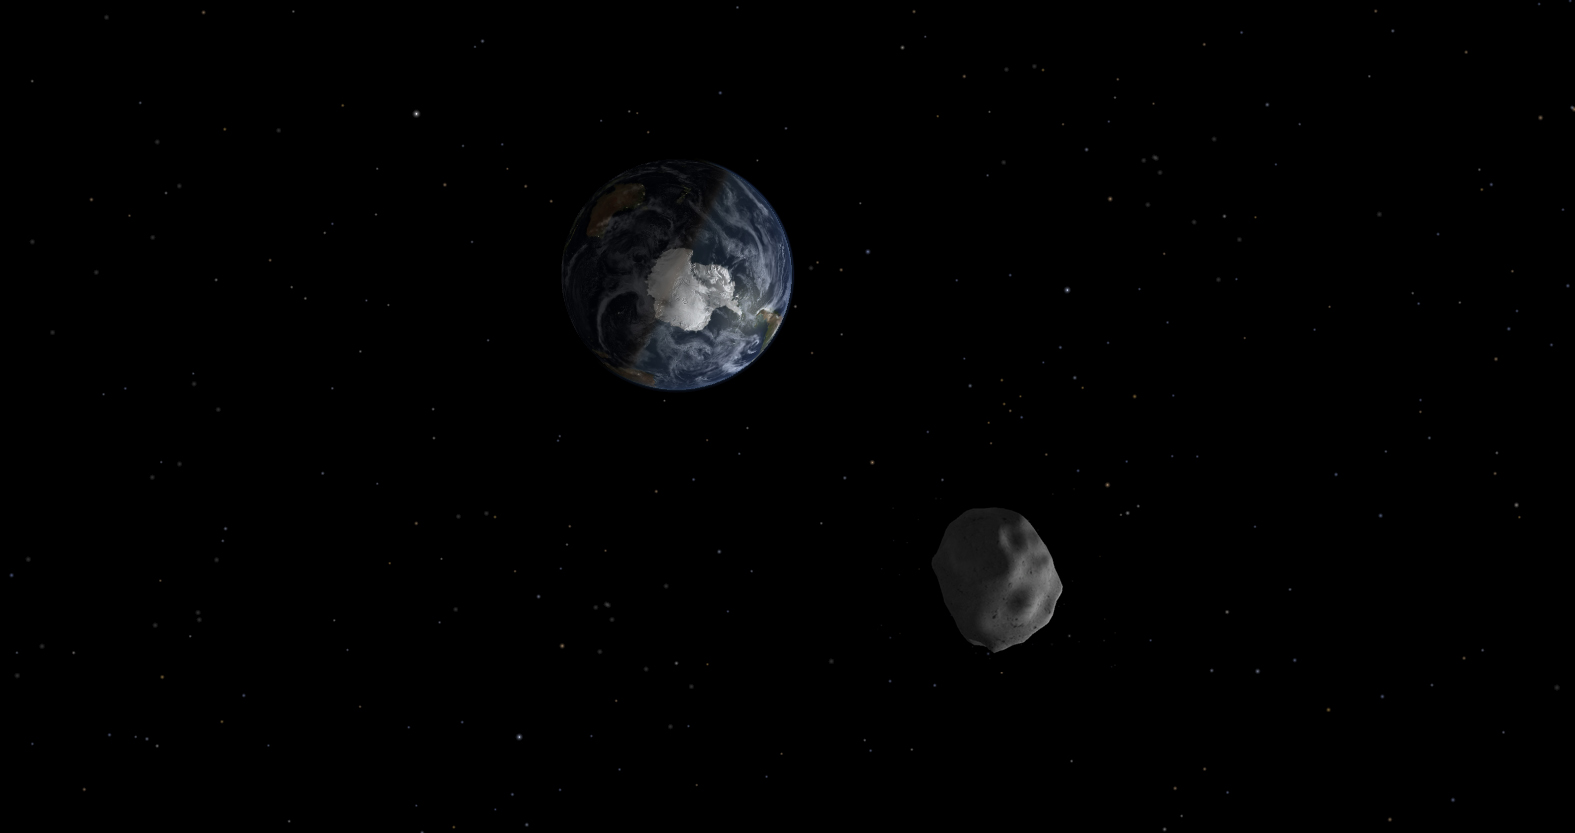 asteroid mars earth - photo #8